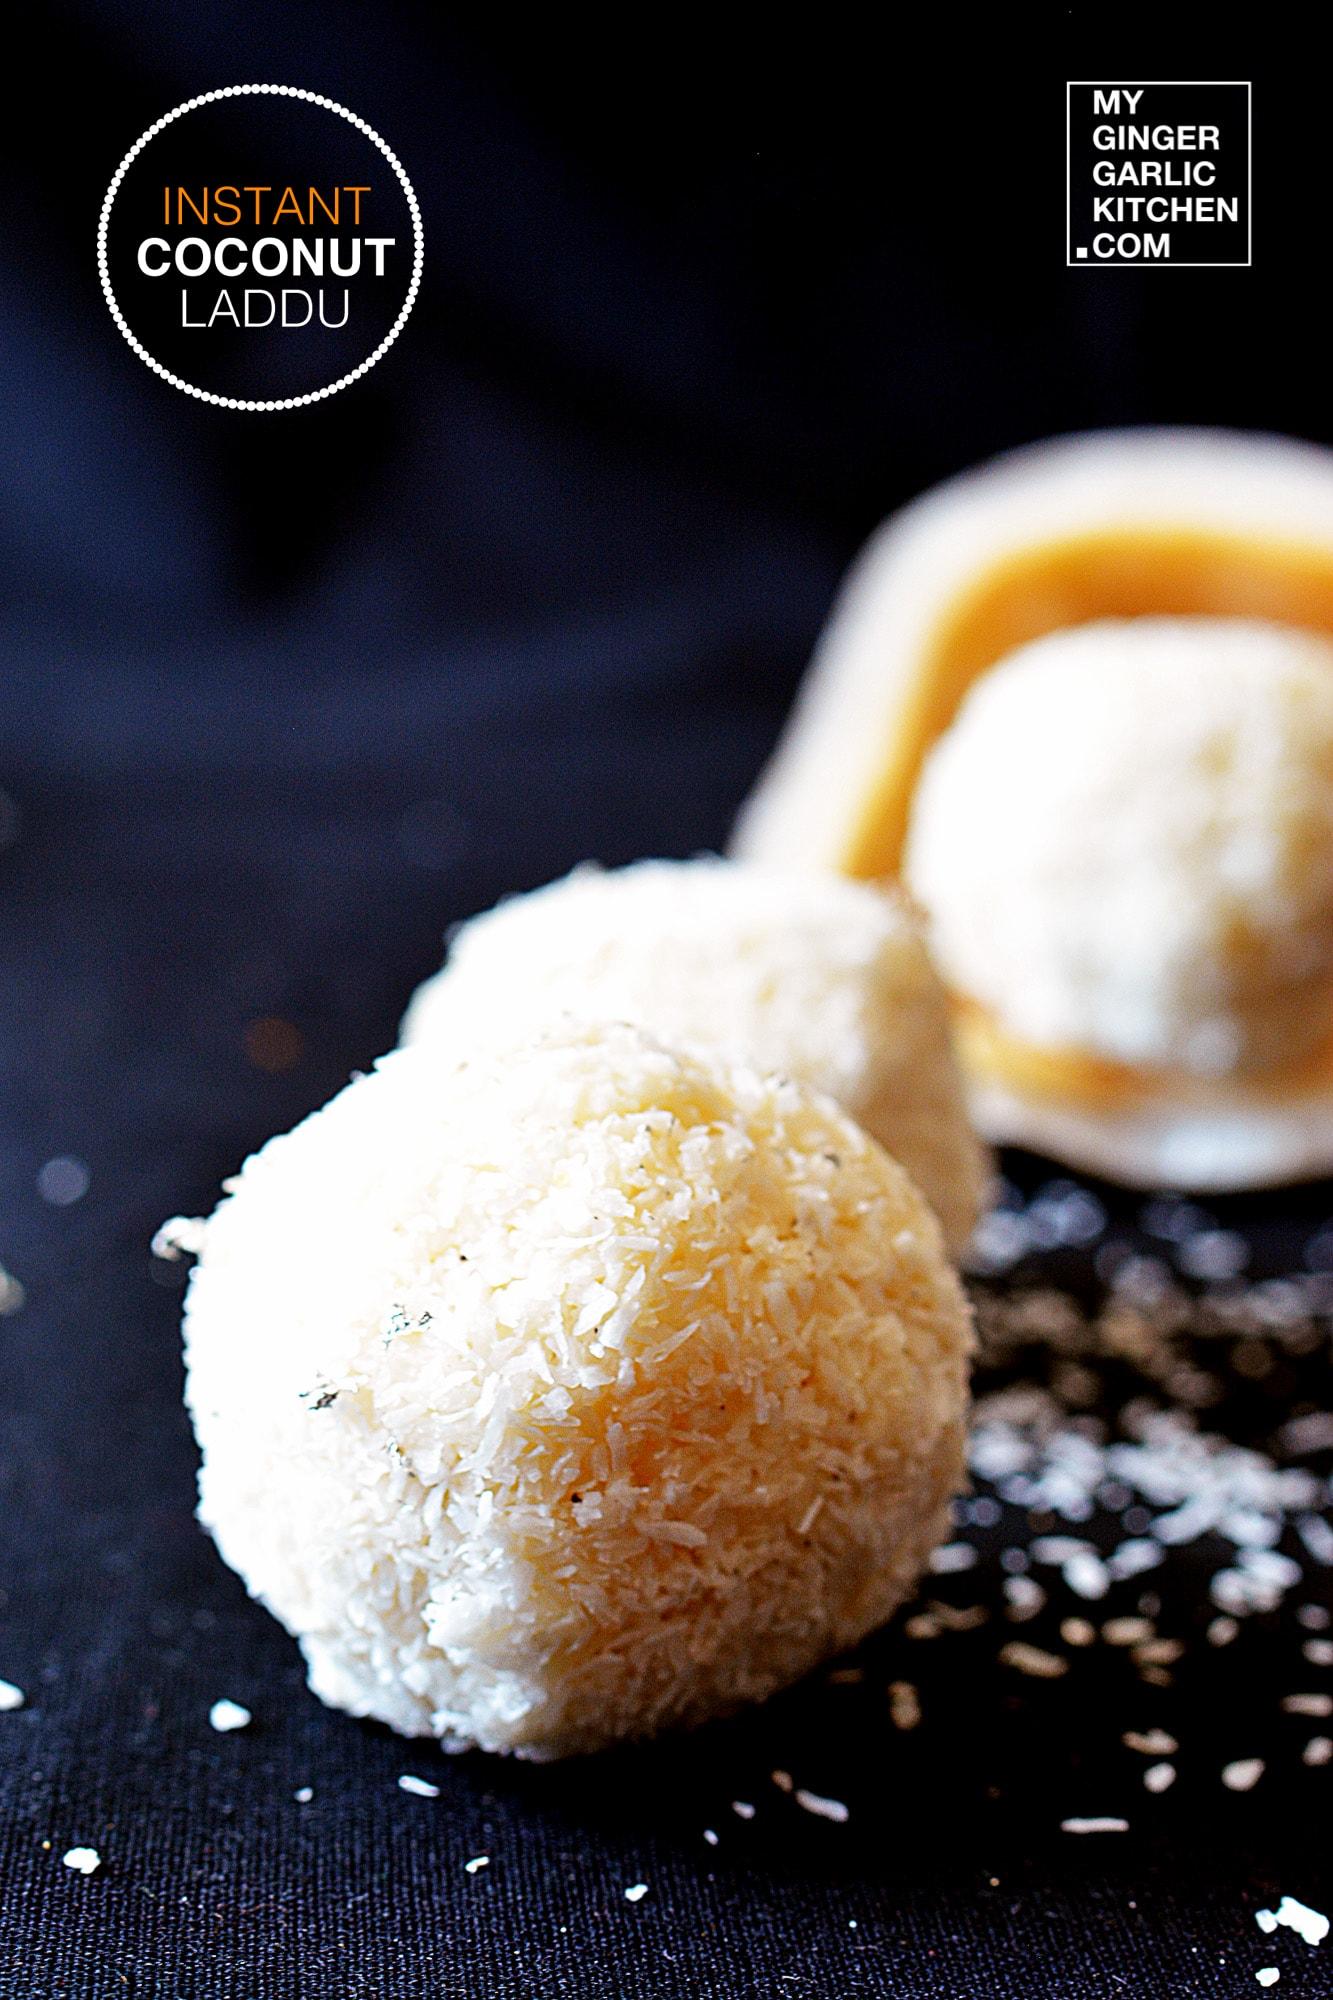 Image - recipe instant coconut laddu anupama paliwal my ginger garlic kitchen 6